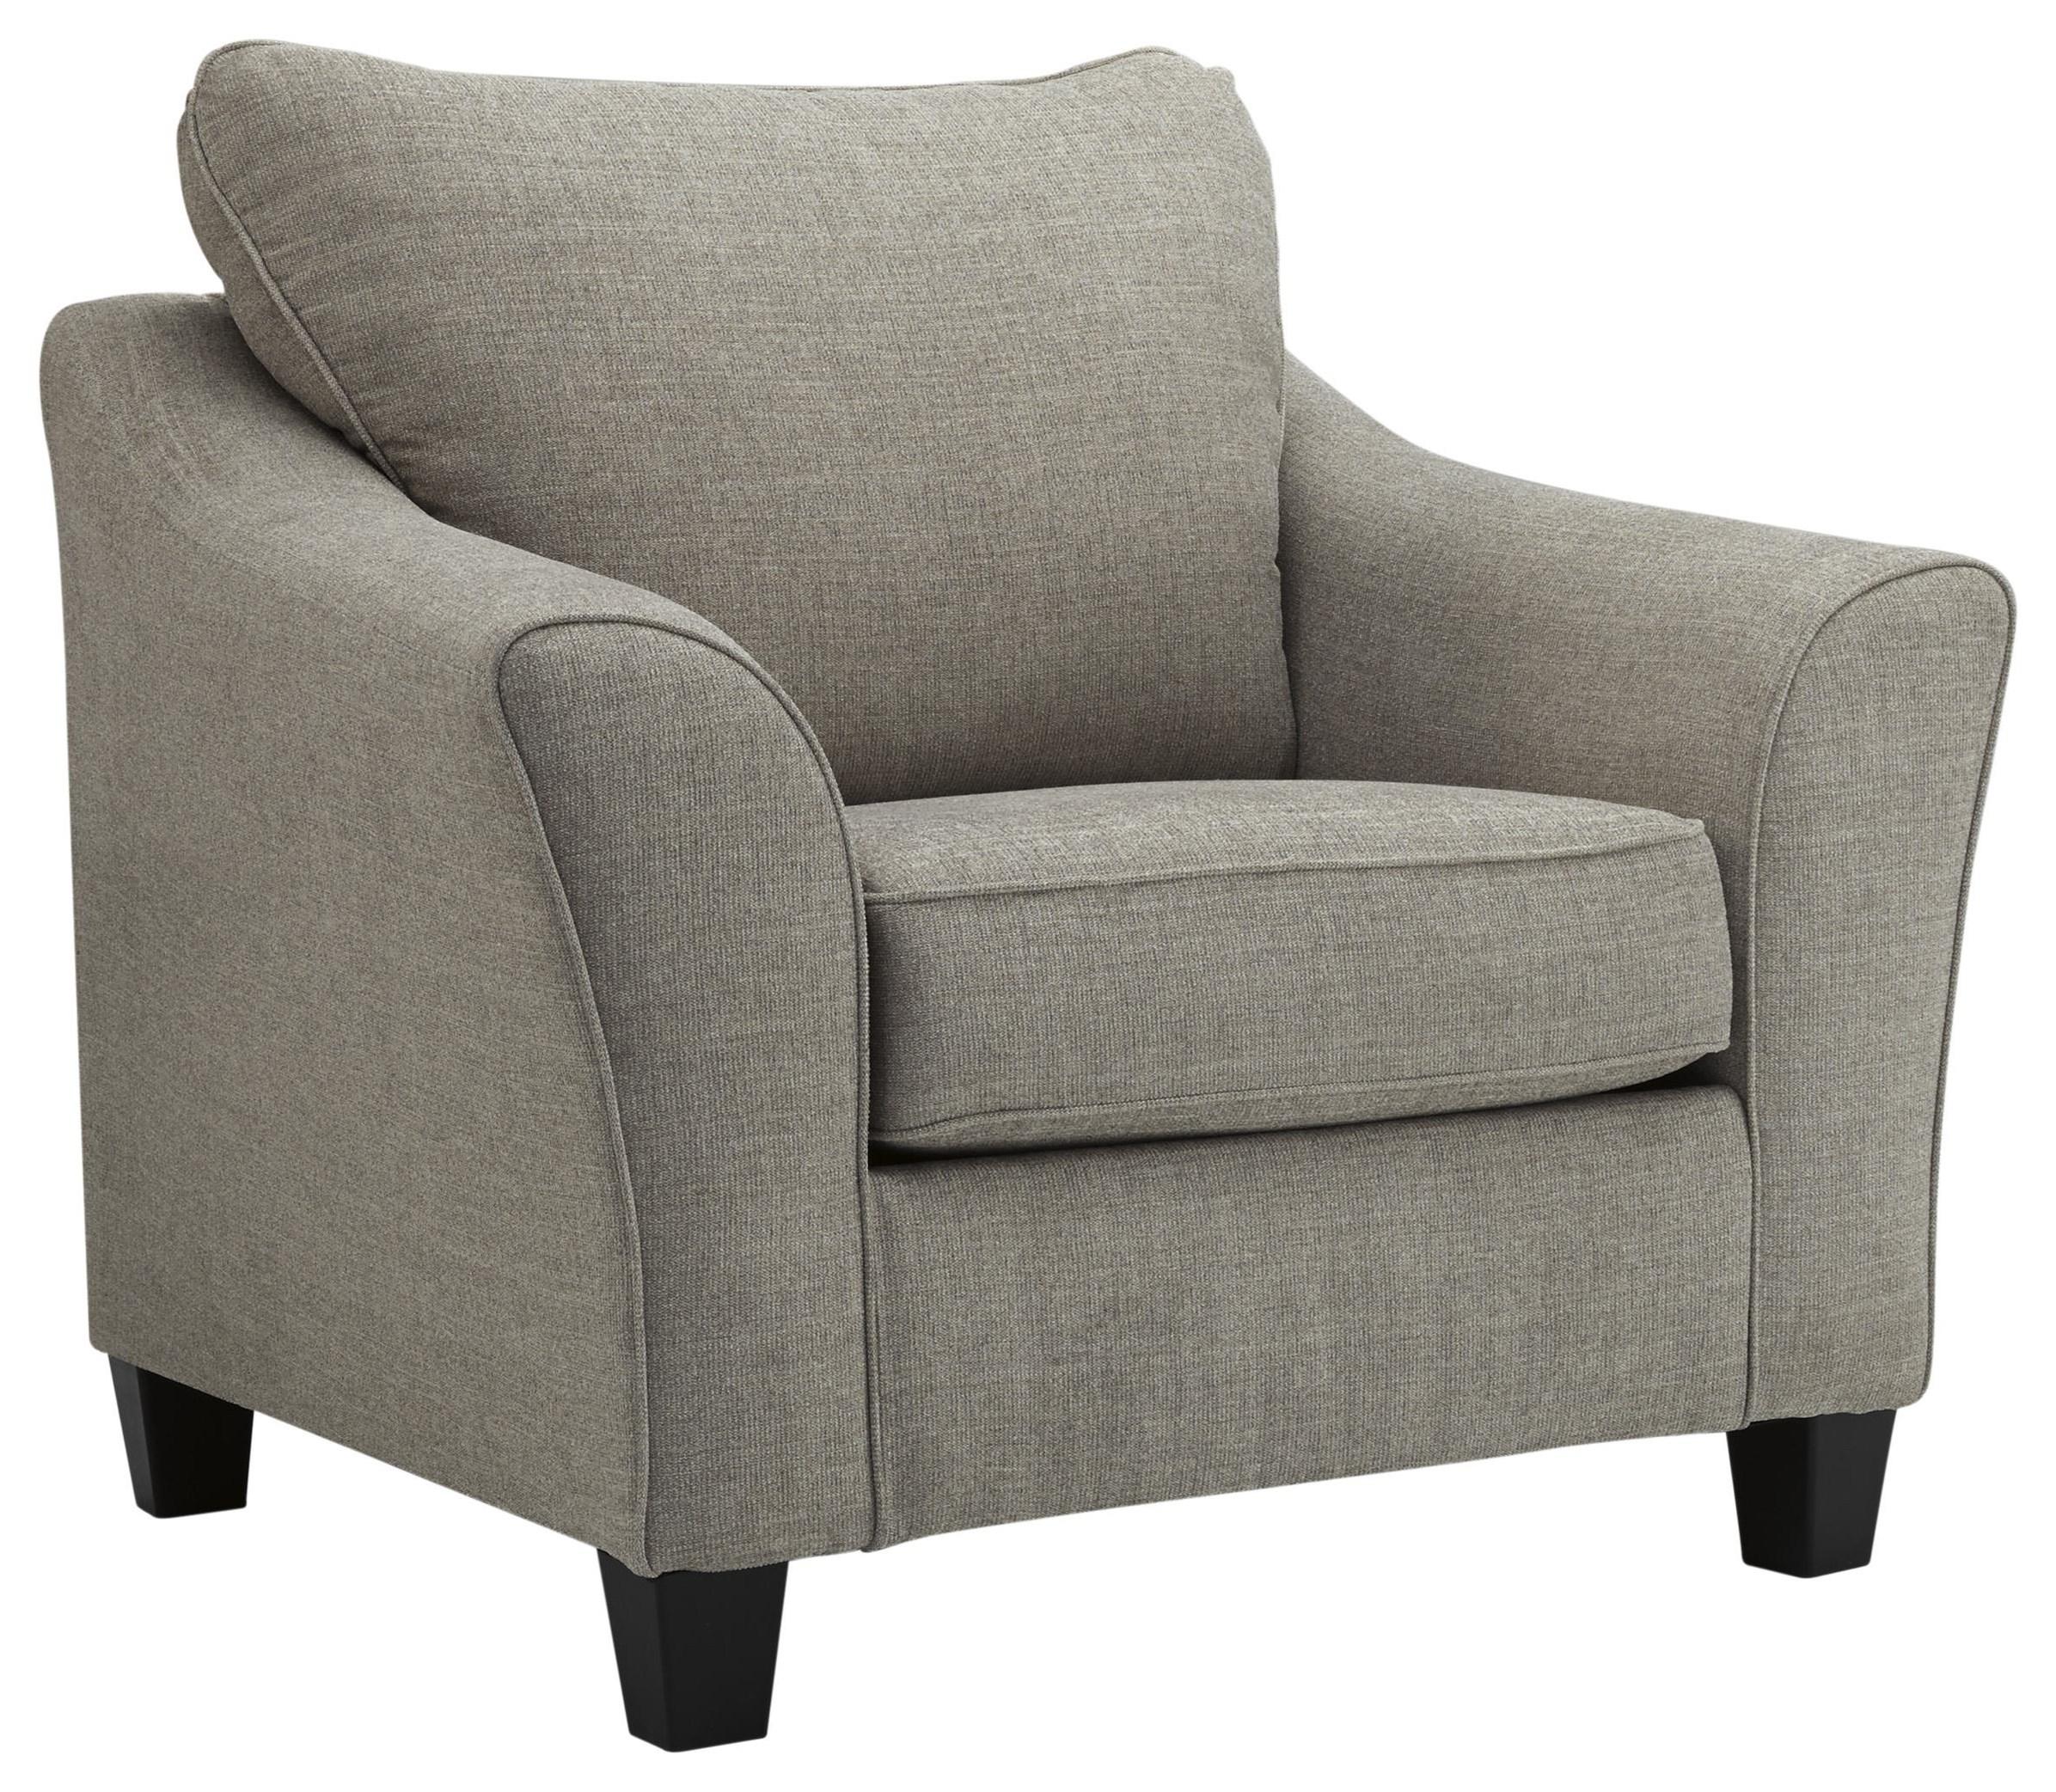 Kestrel Chair by Ashley Furniture at Sam Levitz Furniture